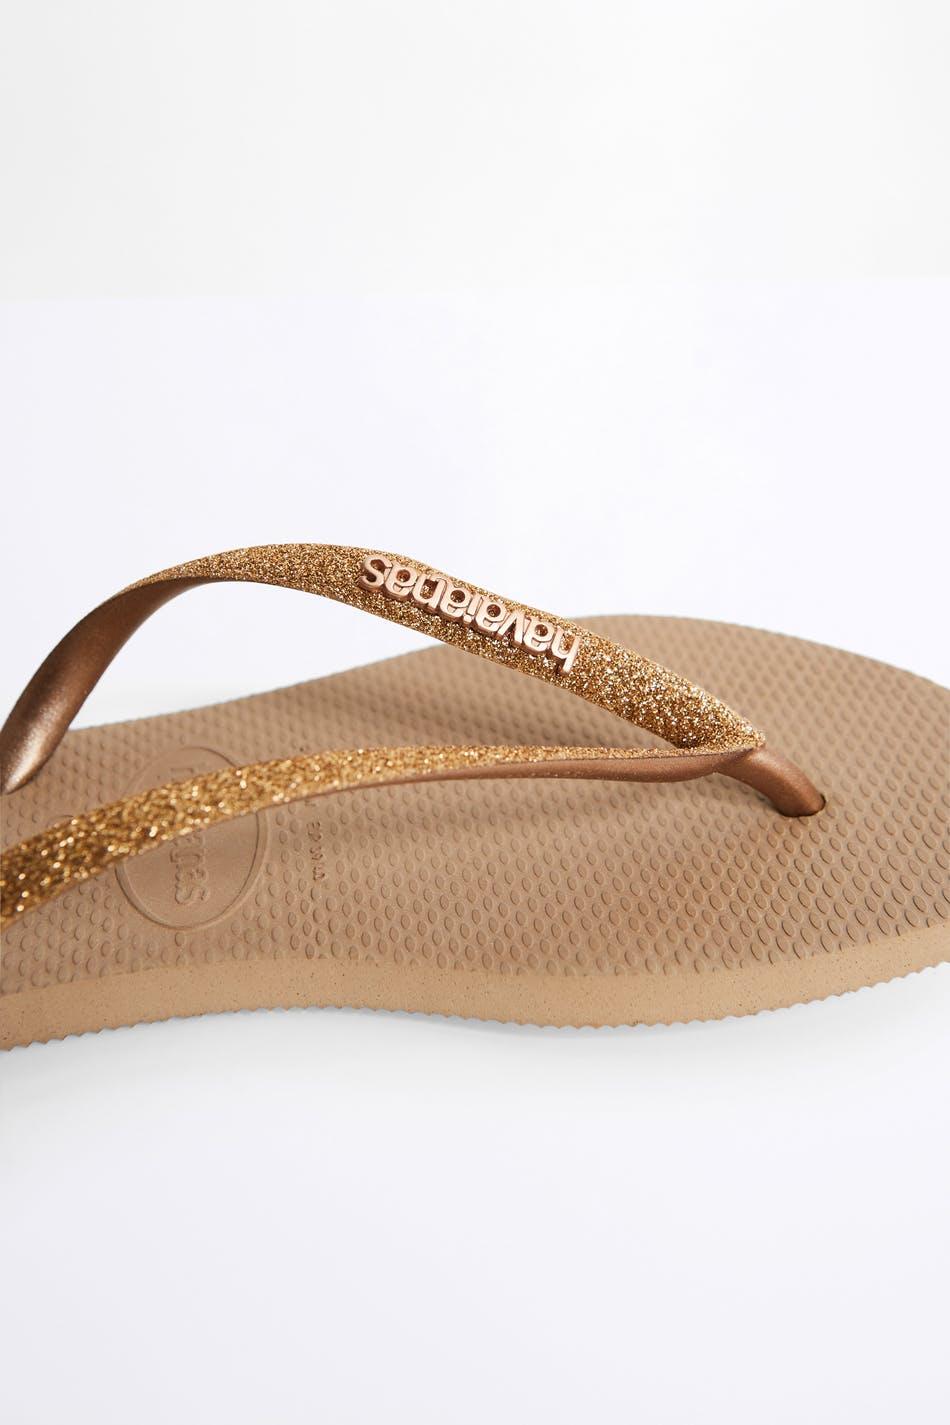 Havaianas glitter flip flops